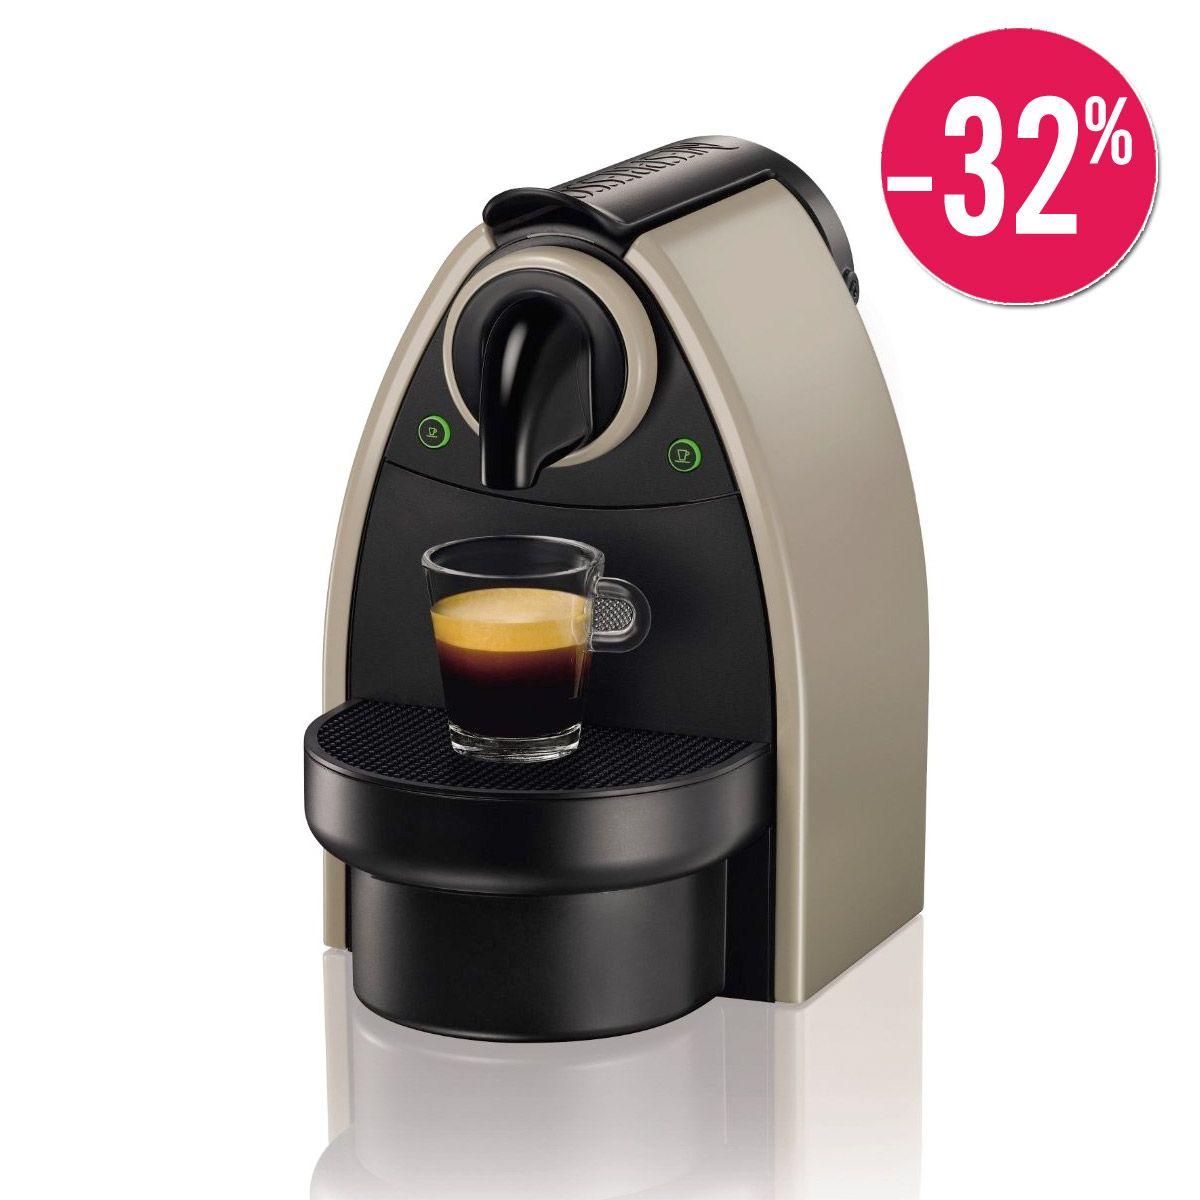 nespresso d290 кофеварка инструкция